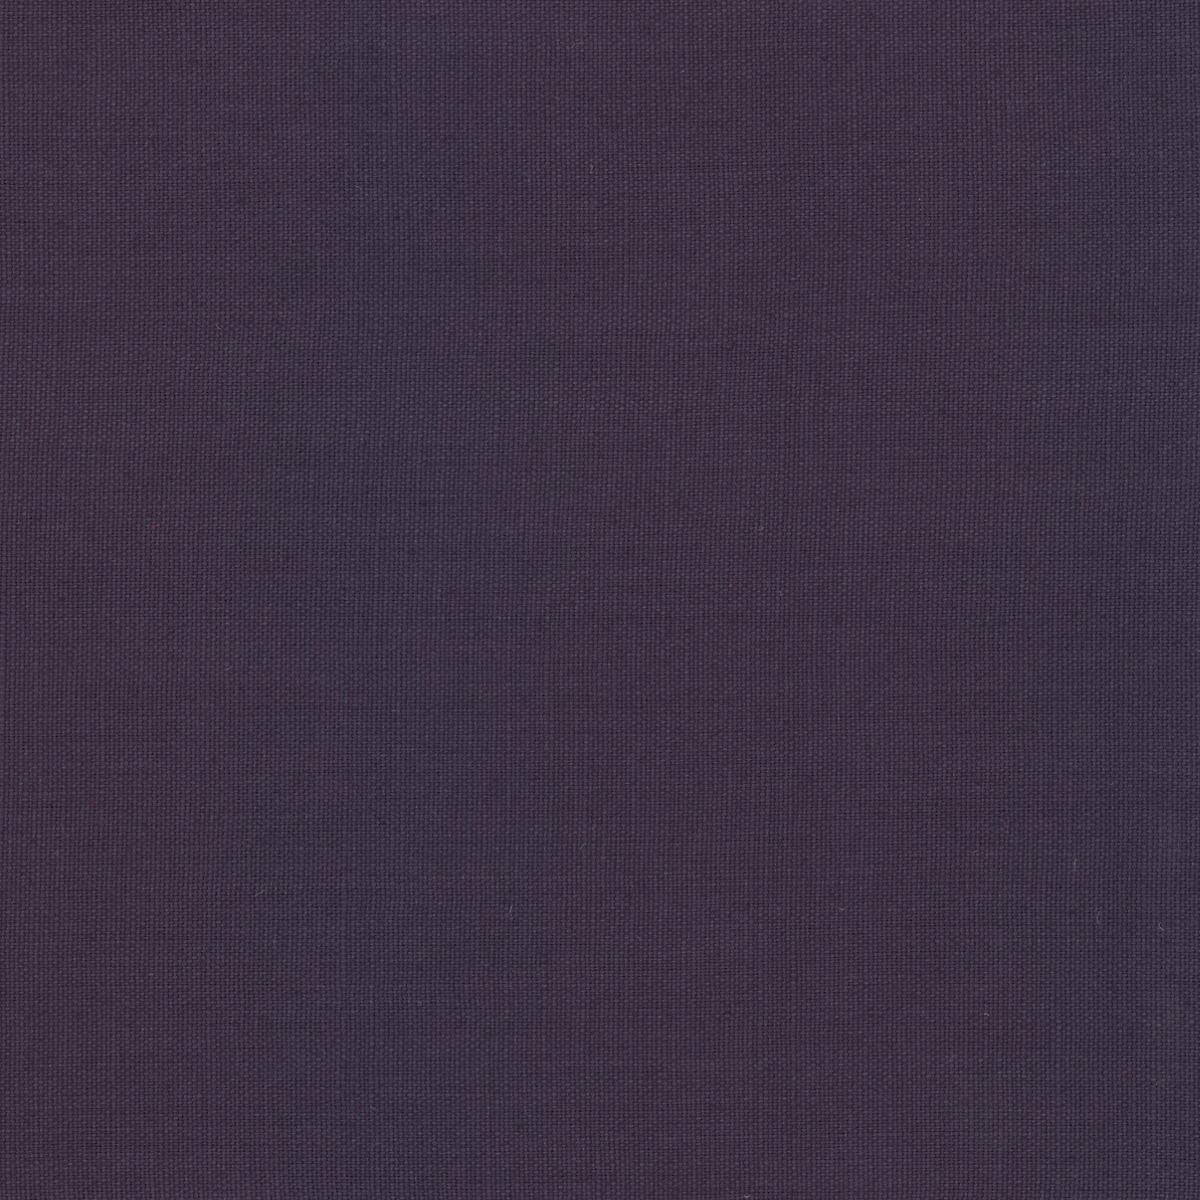 Estate Linen Indigo Fabric